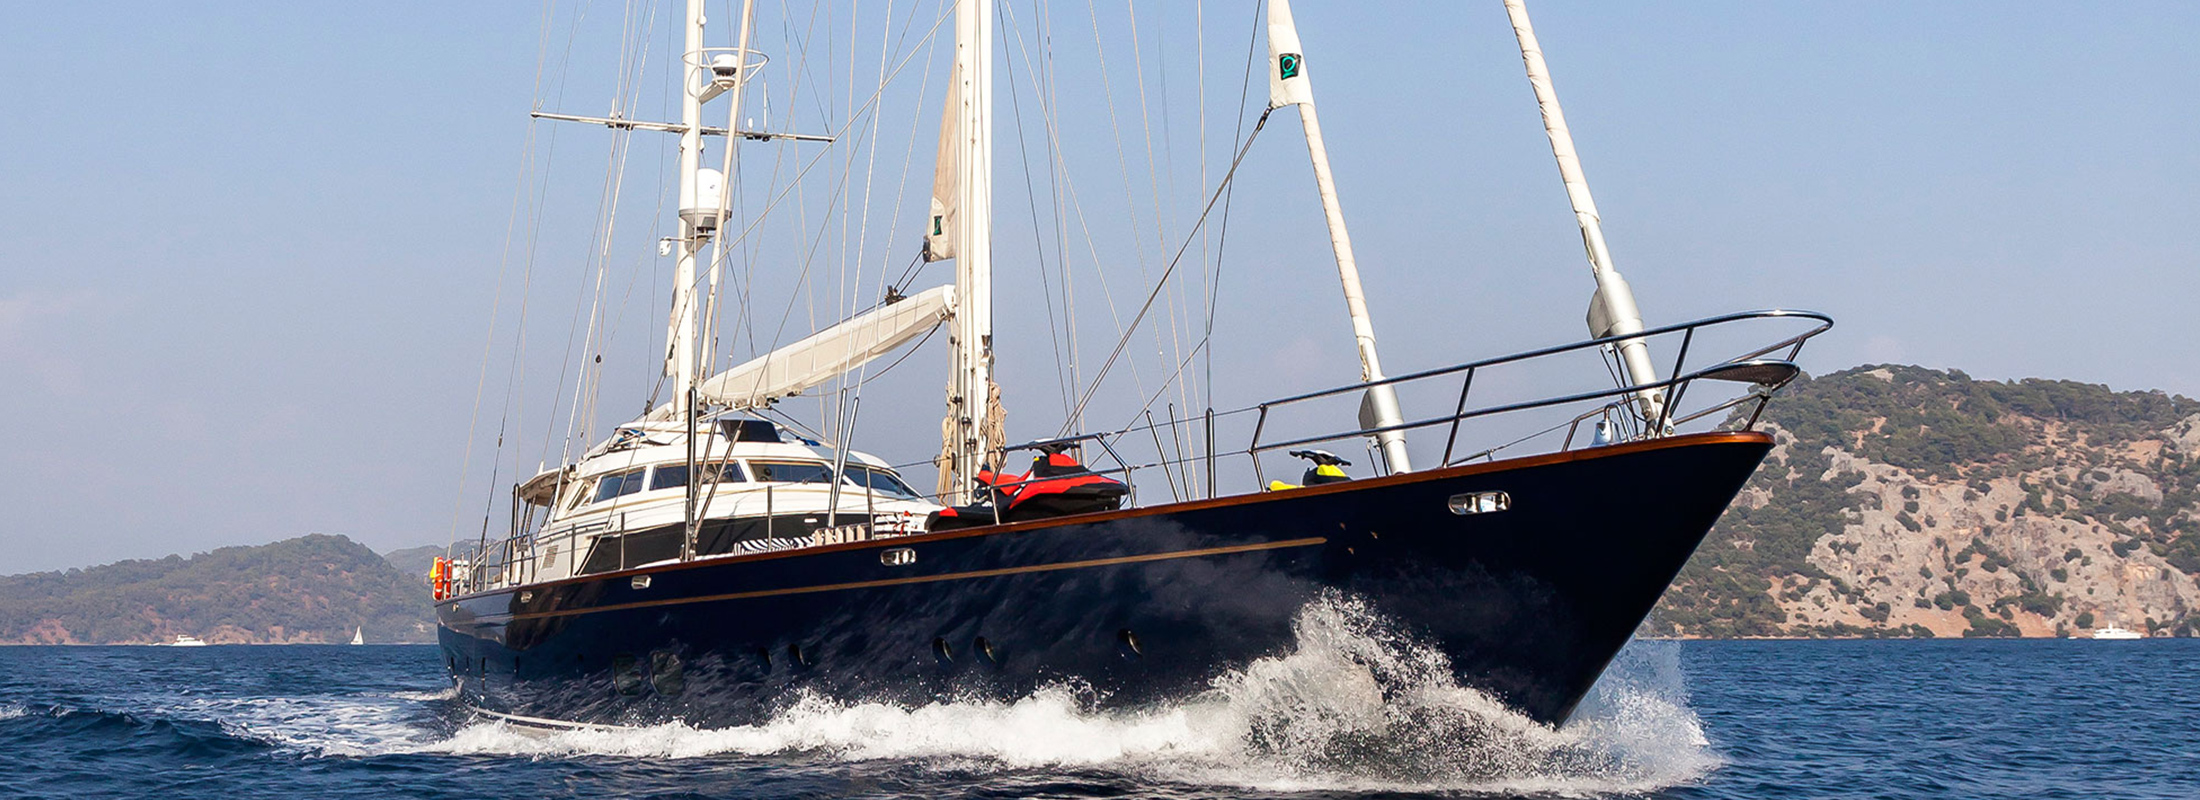 KHALEESI Yacht Charter Details Perini Navi CHARTERWORLD